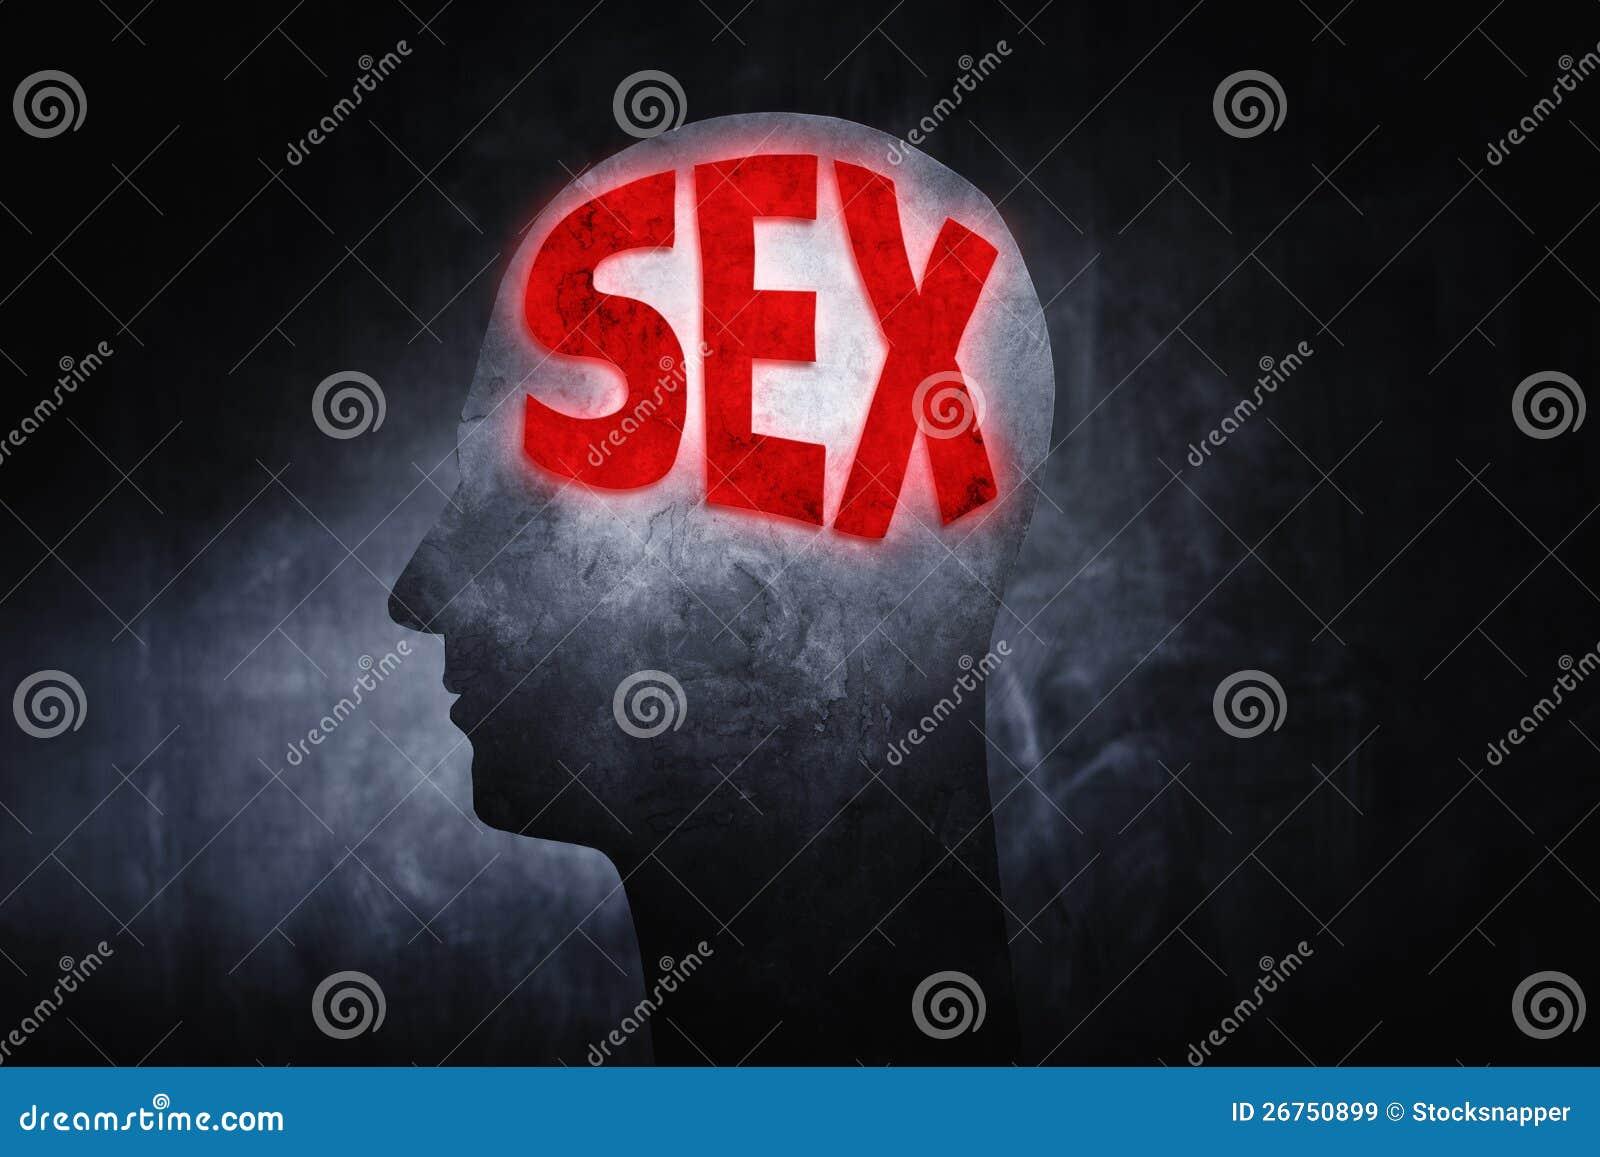 Думать о сексе